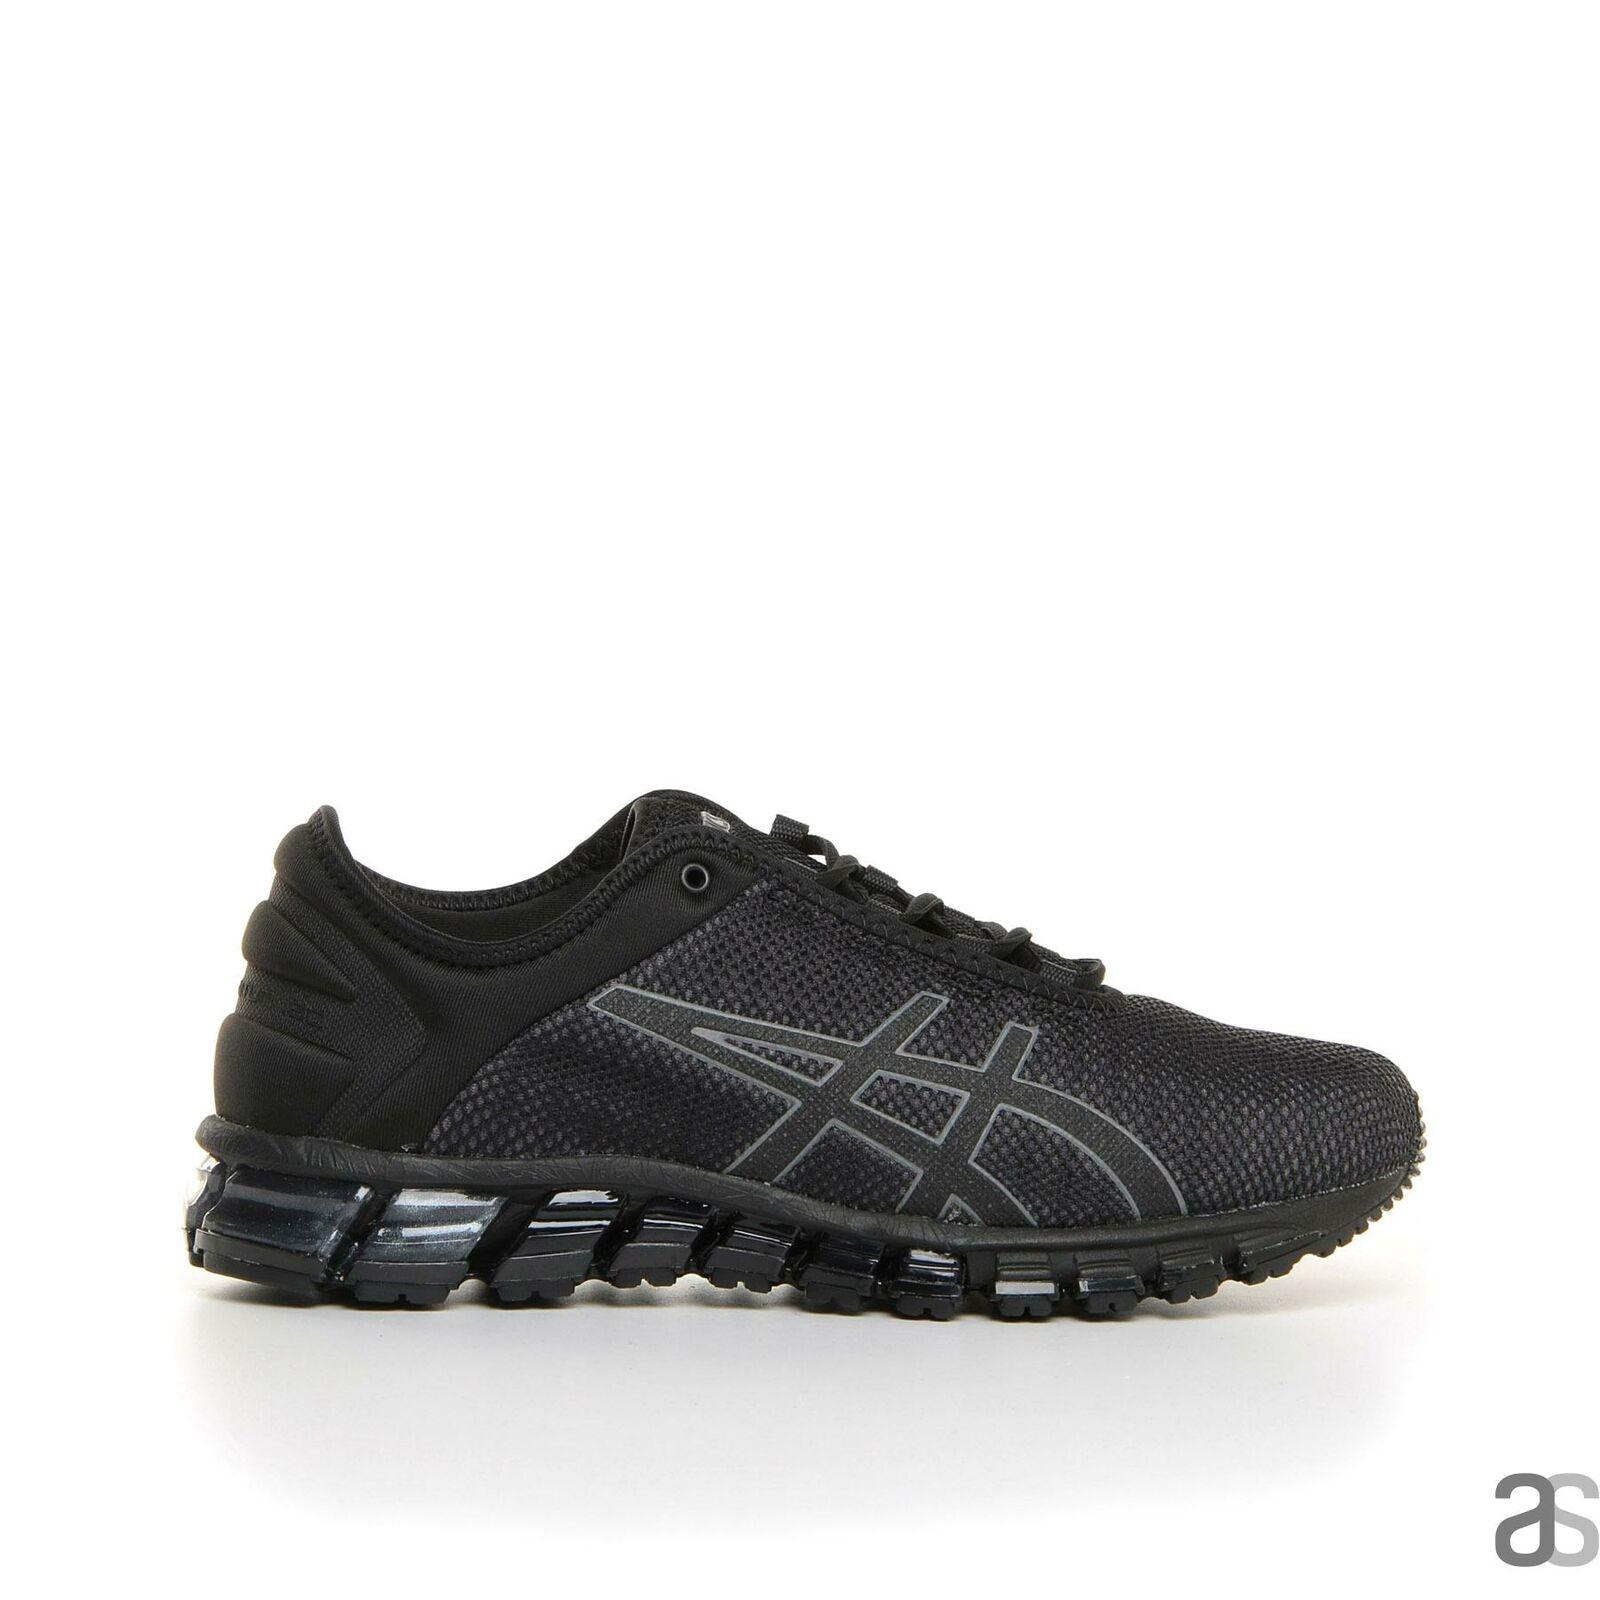 ASICS GEL QUANTUM 180 3 MX chaussures COURSE HOMME 1021A042 001